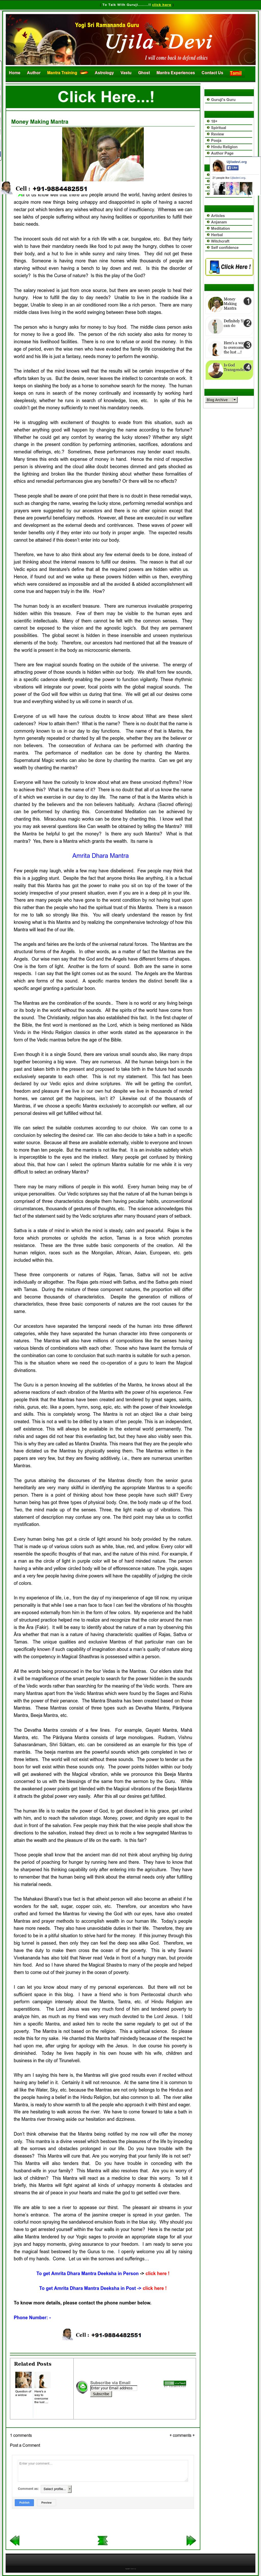 Yogi Sri Ramananda Guru Competitors, Revenue and Employees